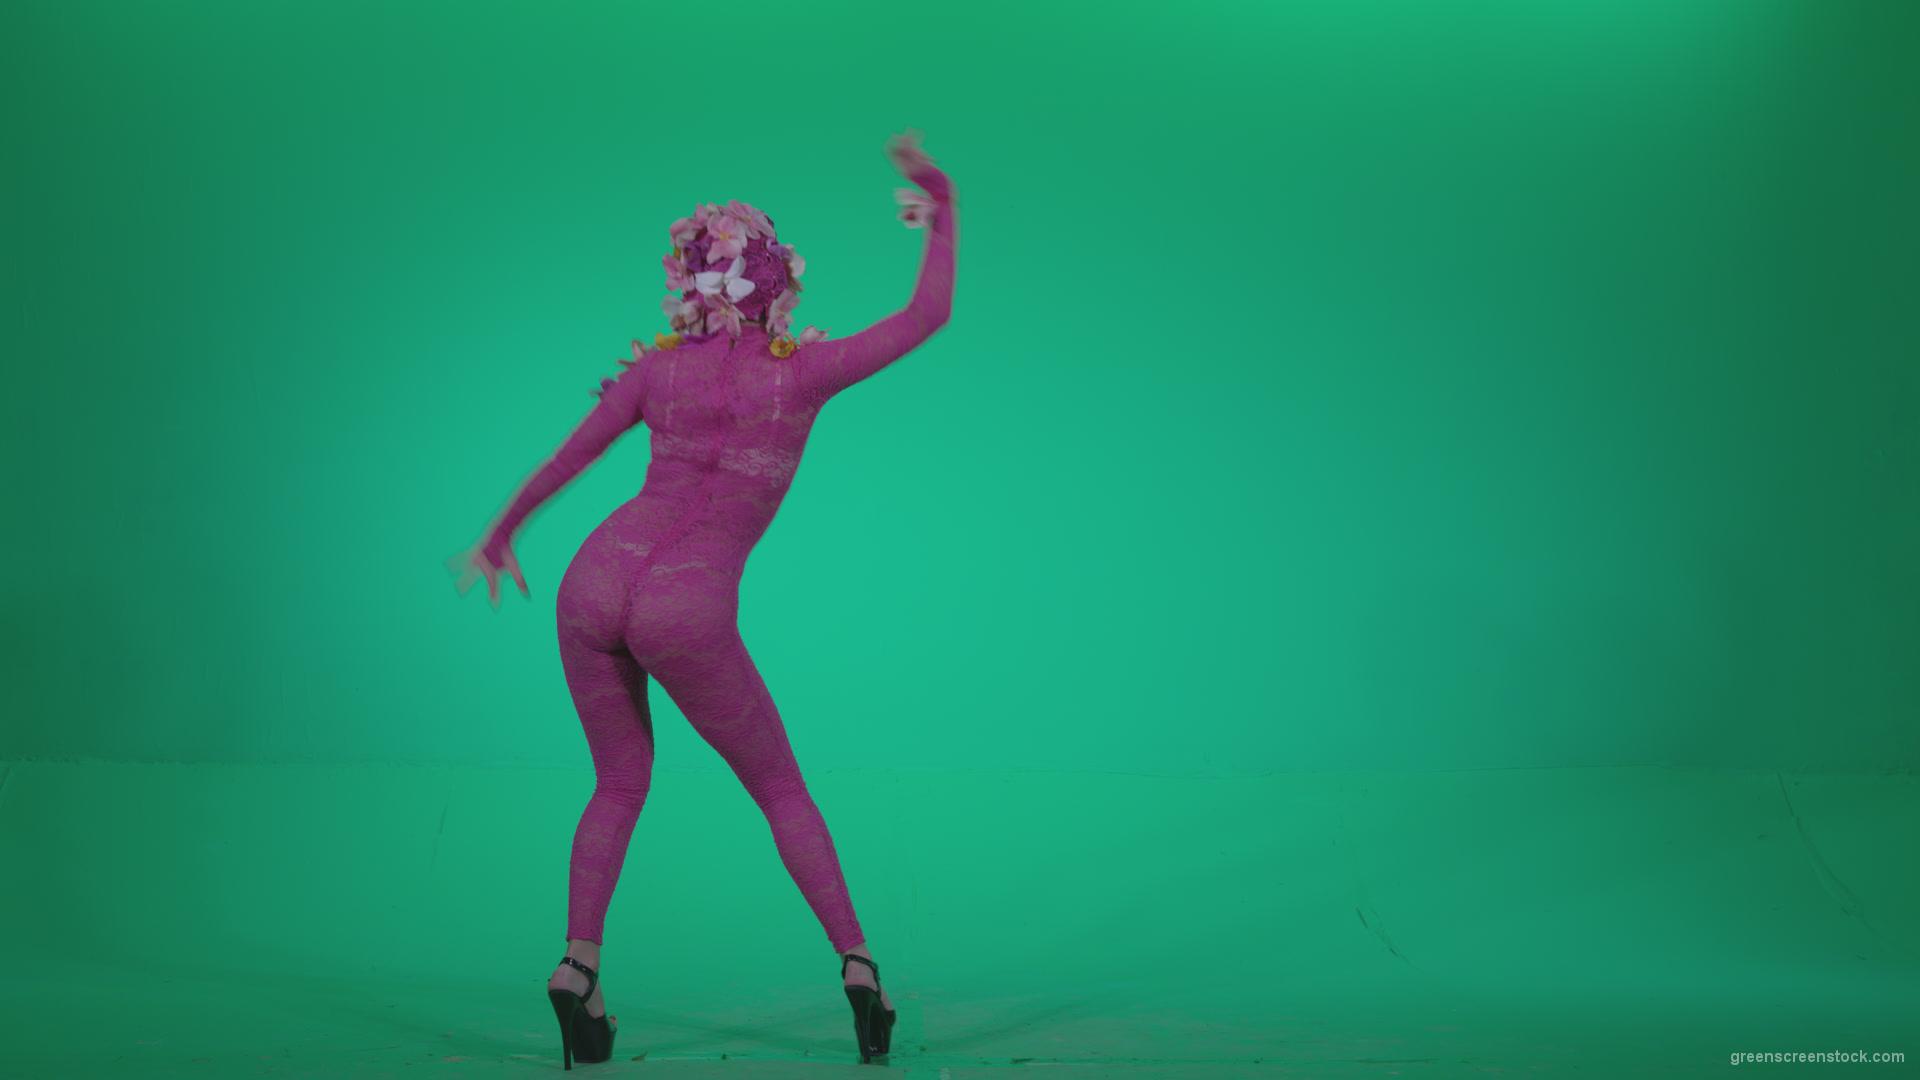 Go go dancer pink flowers f7 green screen video footage video go go dancer pink flowers f7 green screen mightylinksfo